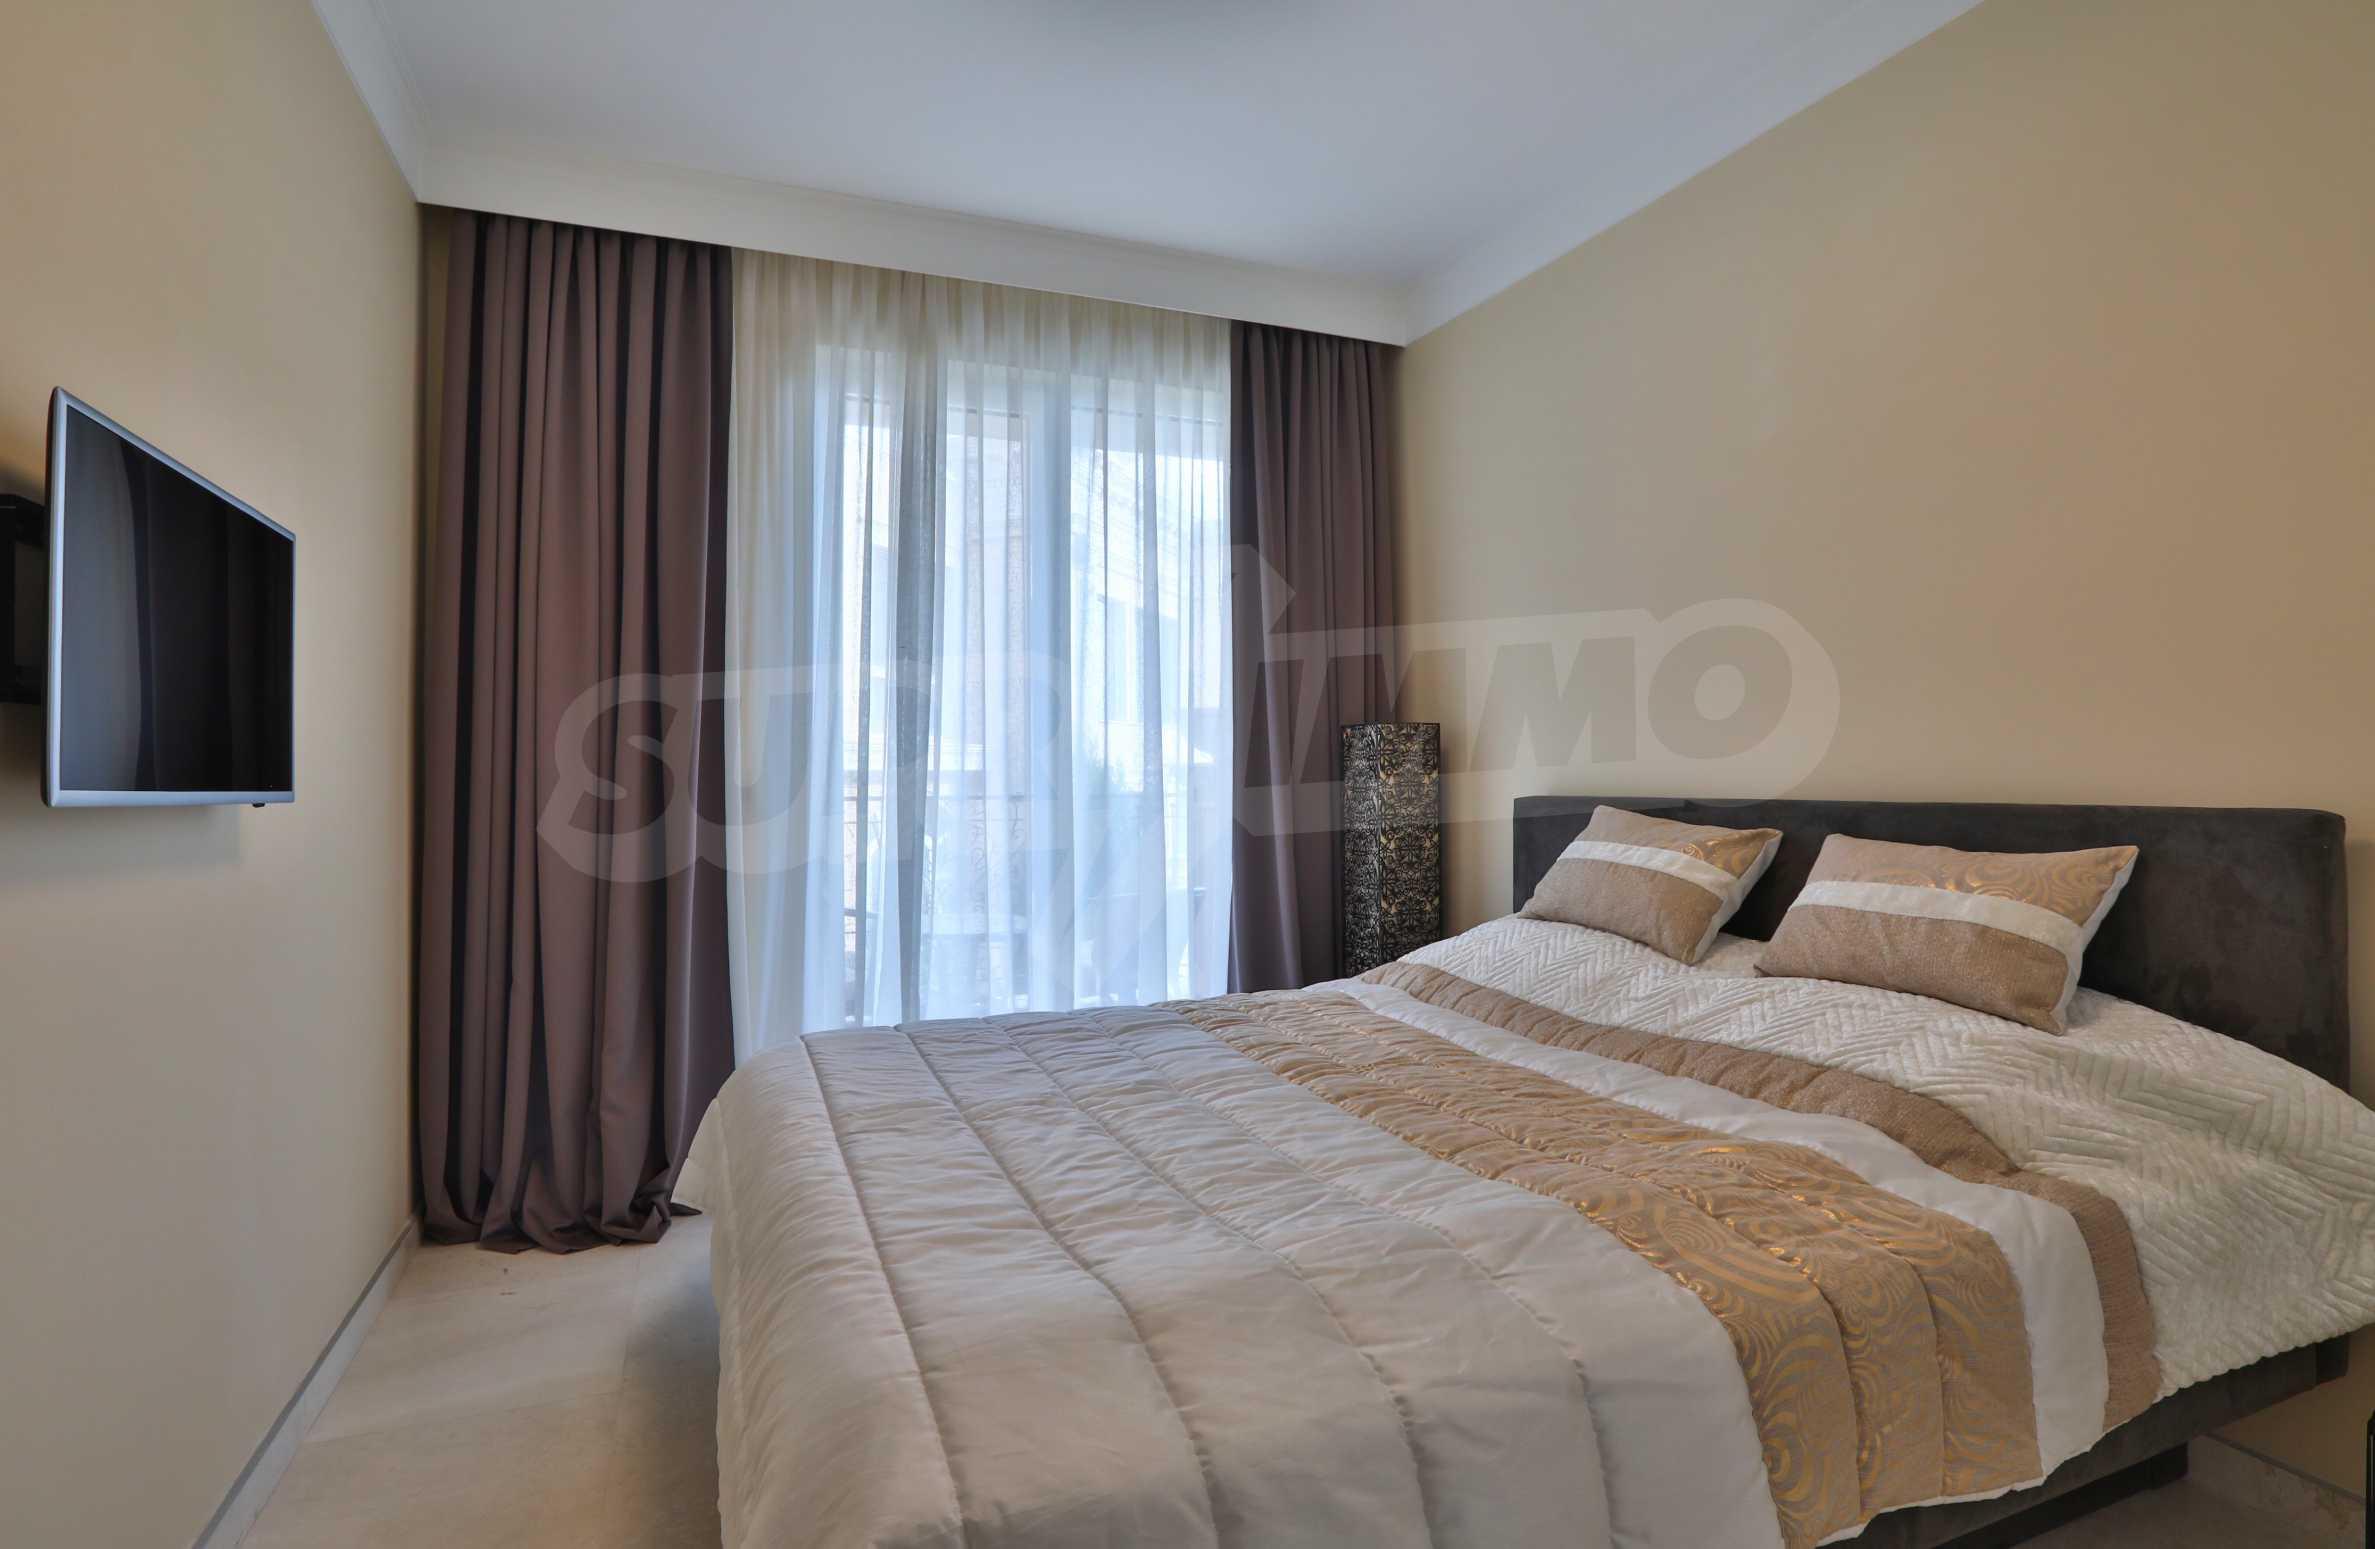 Exclusive 2-bedroom beachfront apartment in the prestigious Belle Époque Beach Residence 17